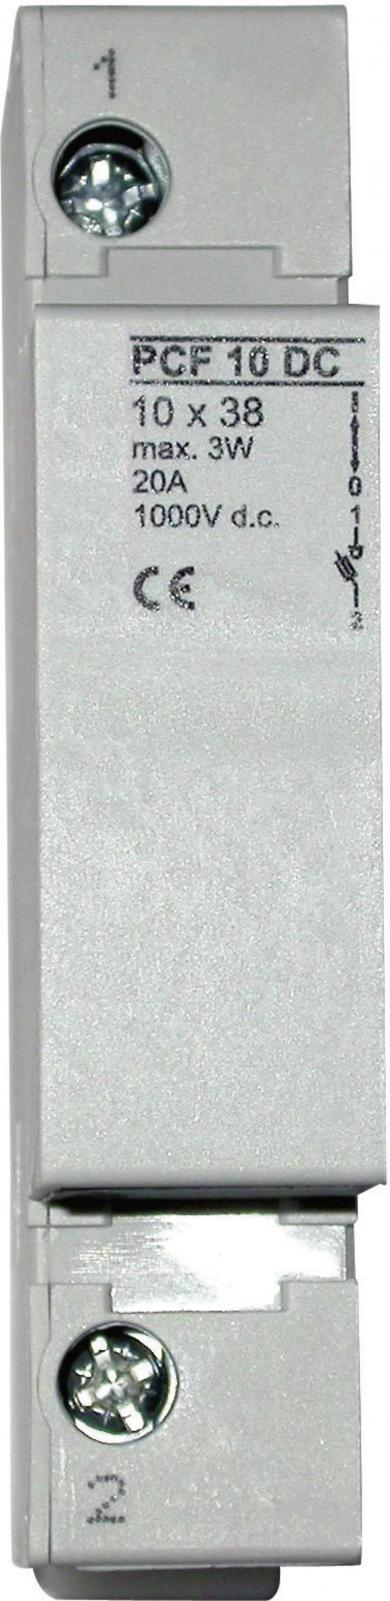 Suport siguranţă Eska 10,3 x 38 mm, tip 1038002, 2 poli